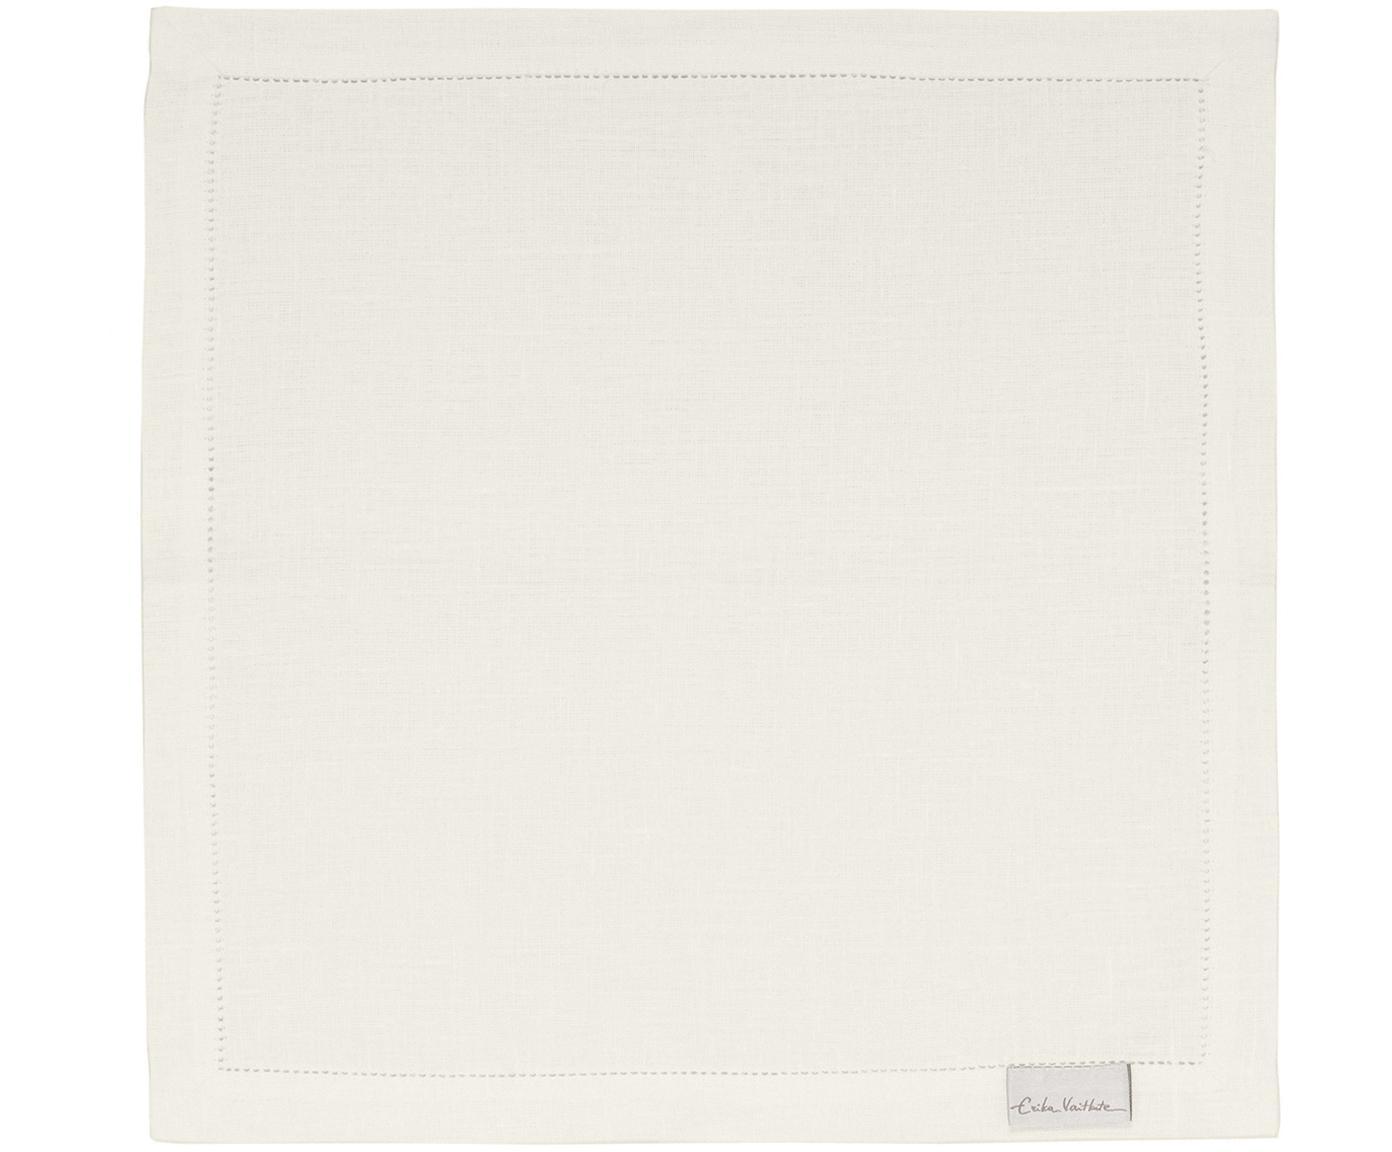 Leinen-Servietten Alanta mit Hohlsaum, 6 Stück, Cremeweiss, 42 x 42 cm